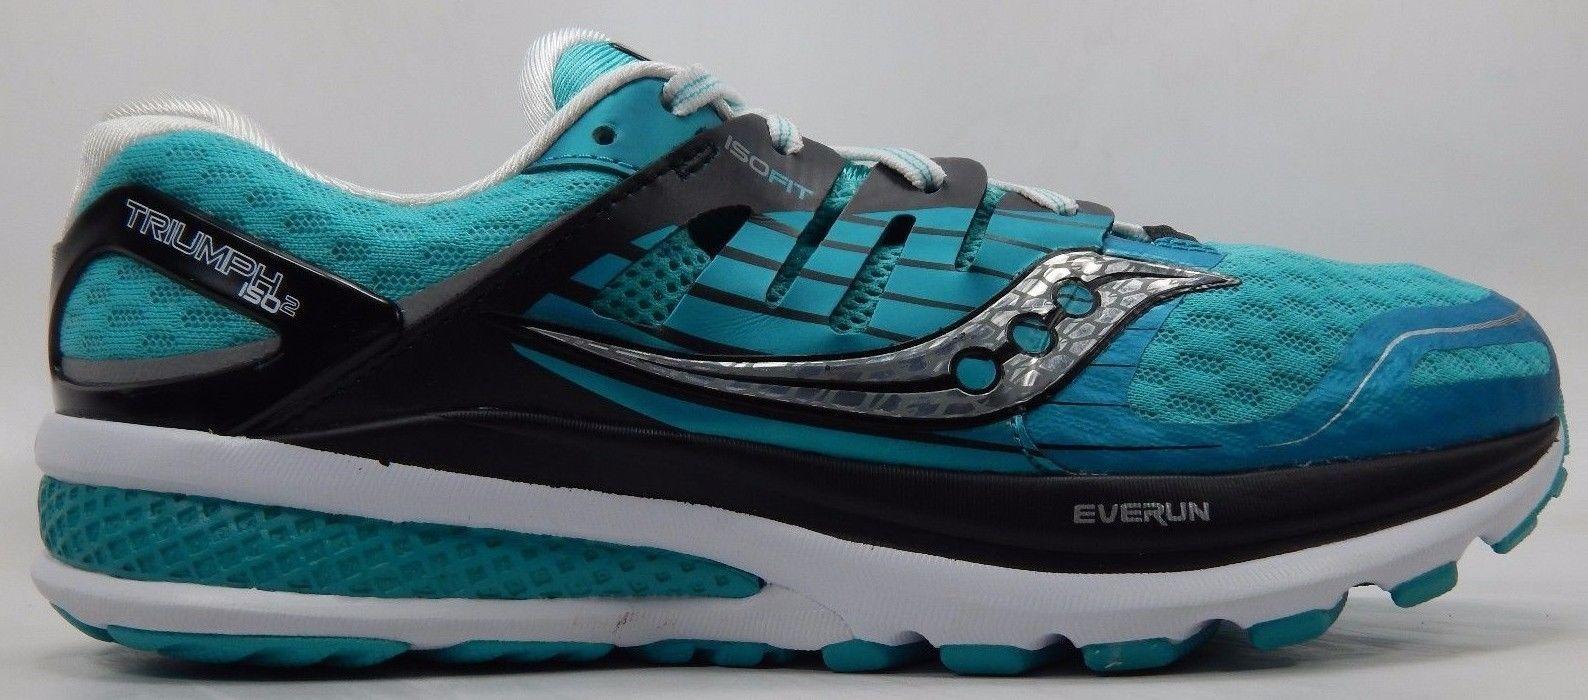 Saucony Triumph ISO 2 Women's Running Shoes Size US 10.5 M (B) EU 42.5 S10290-5